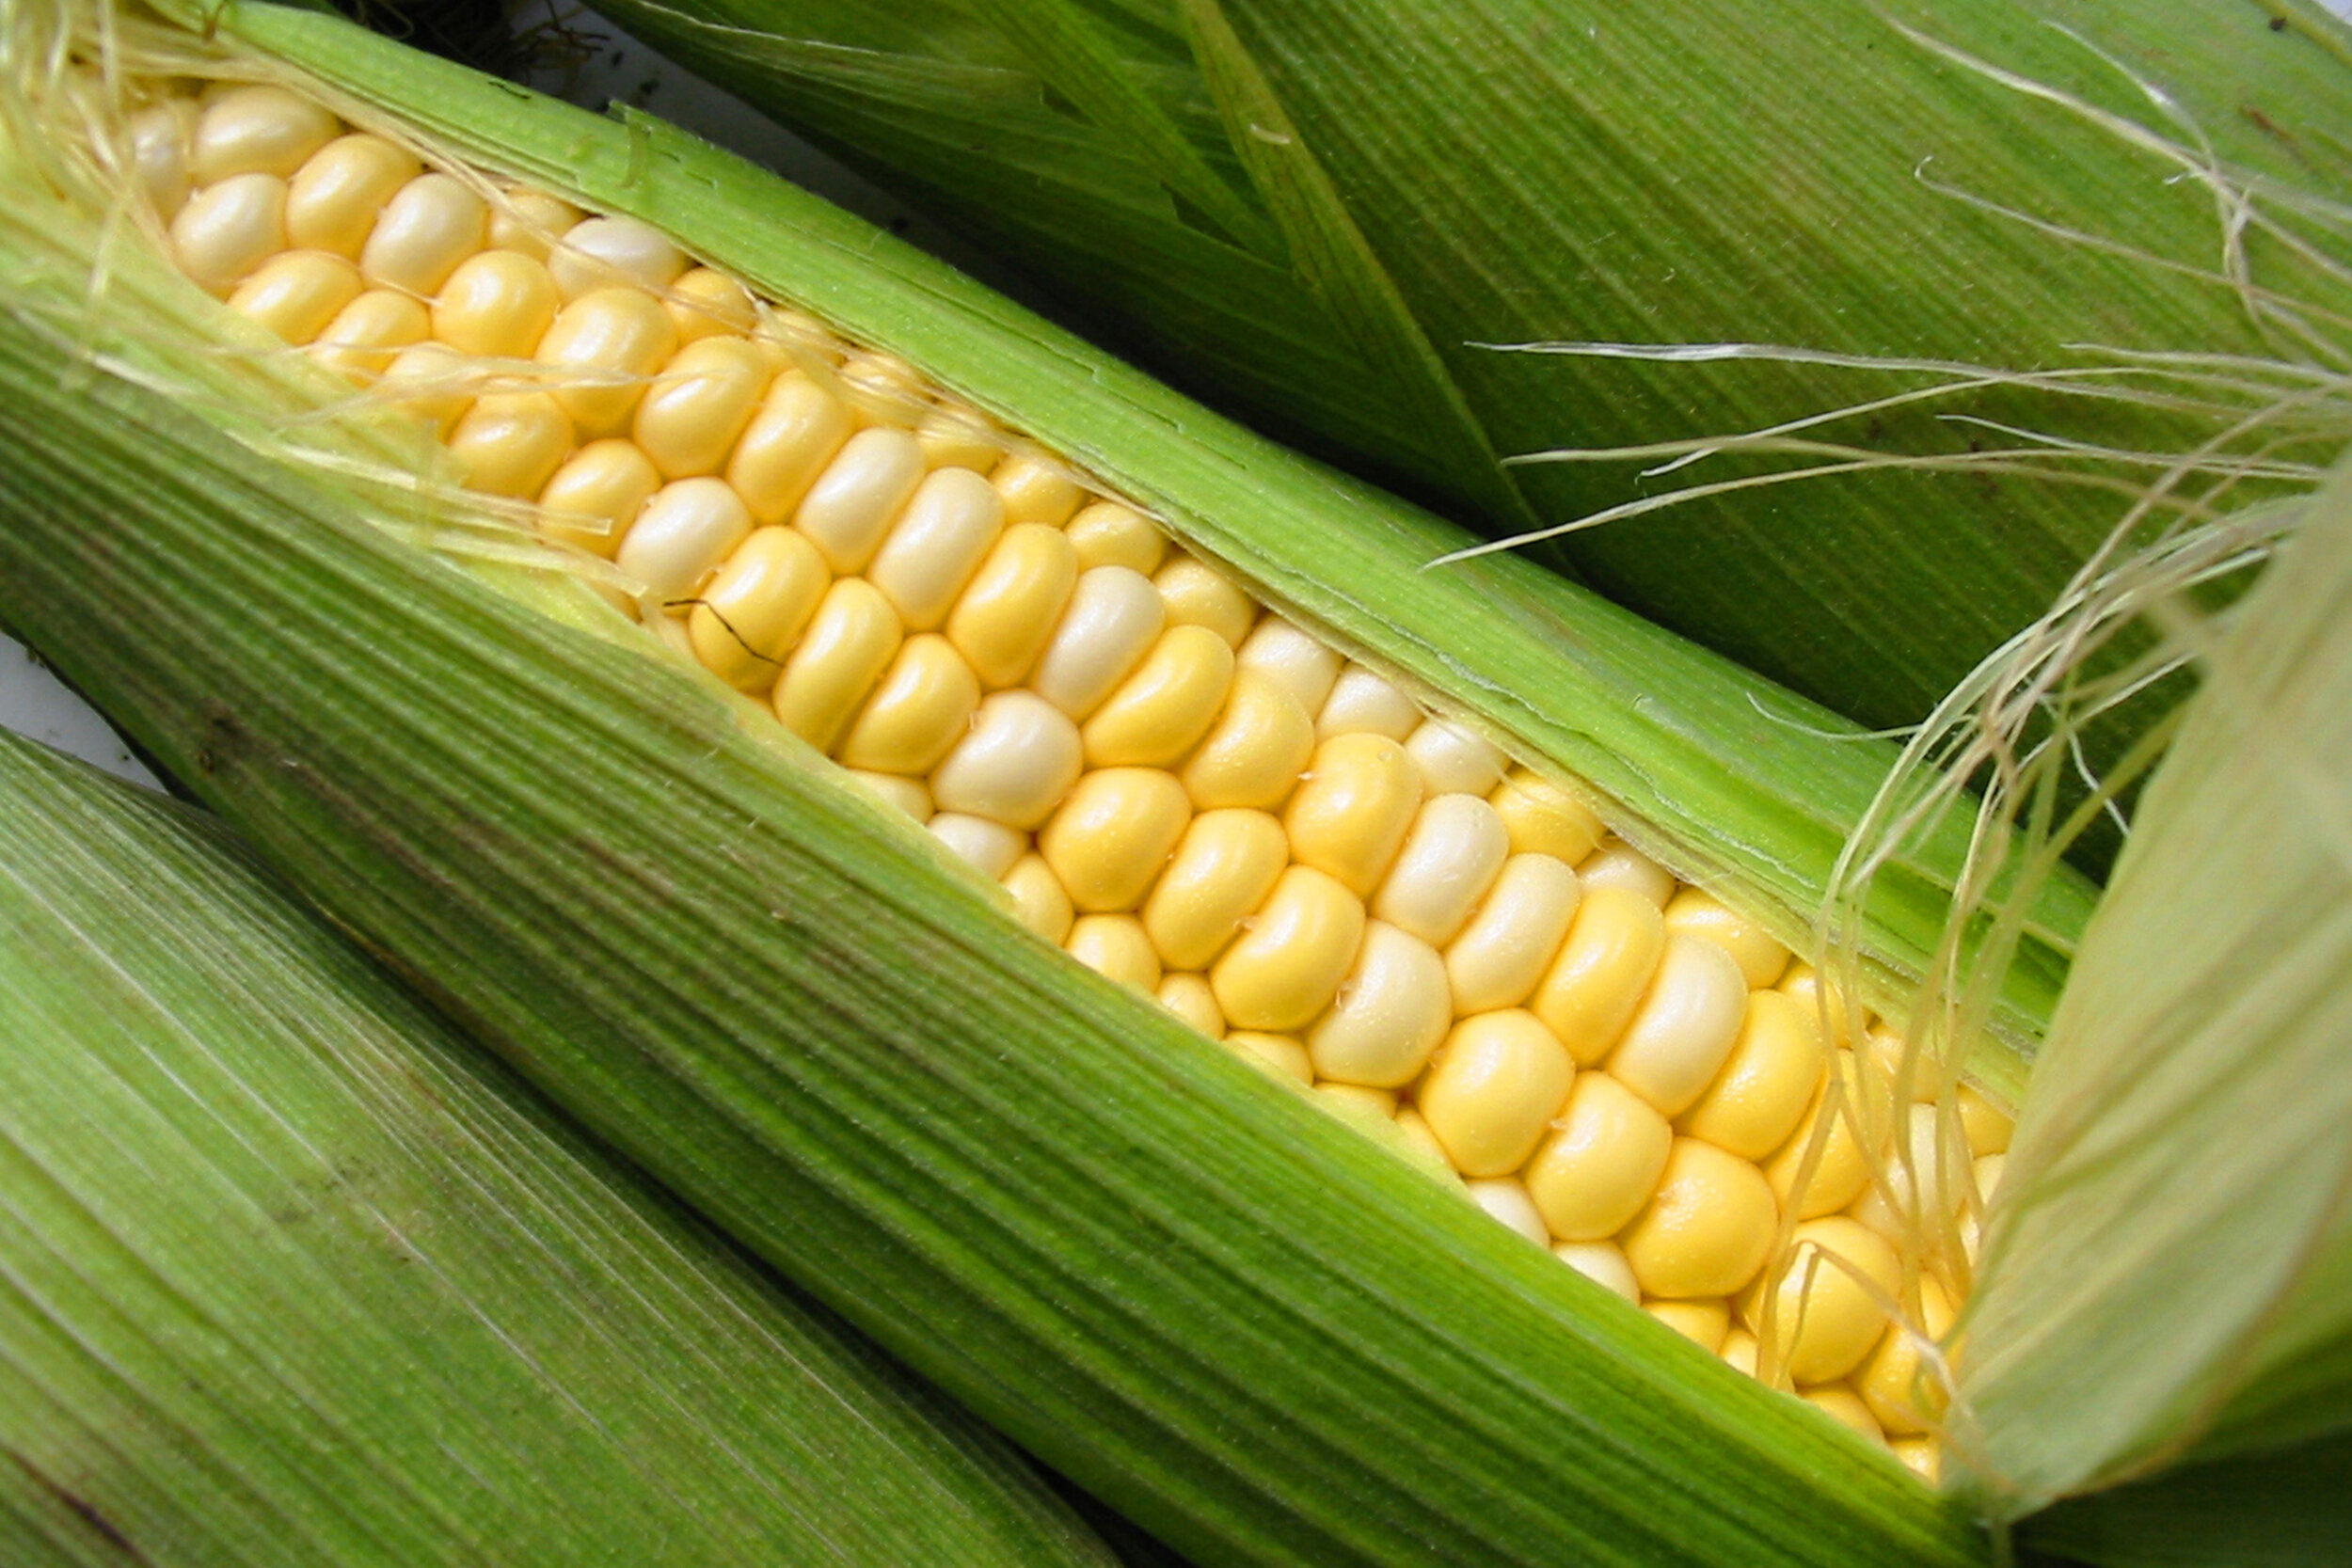 SquarespaceImage19-Corn-SweetCorn.jpg